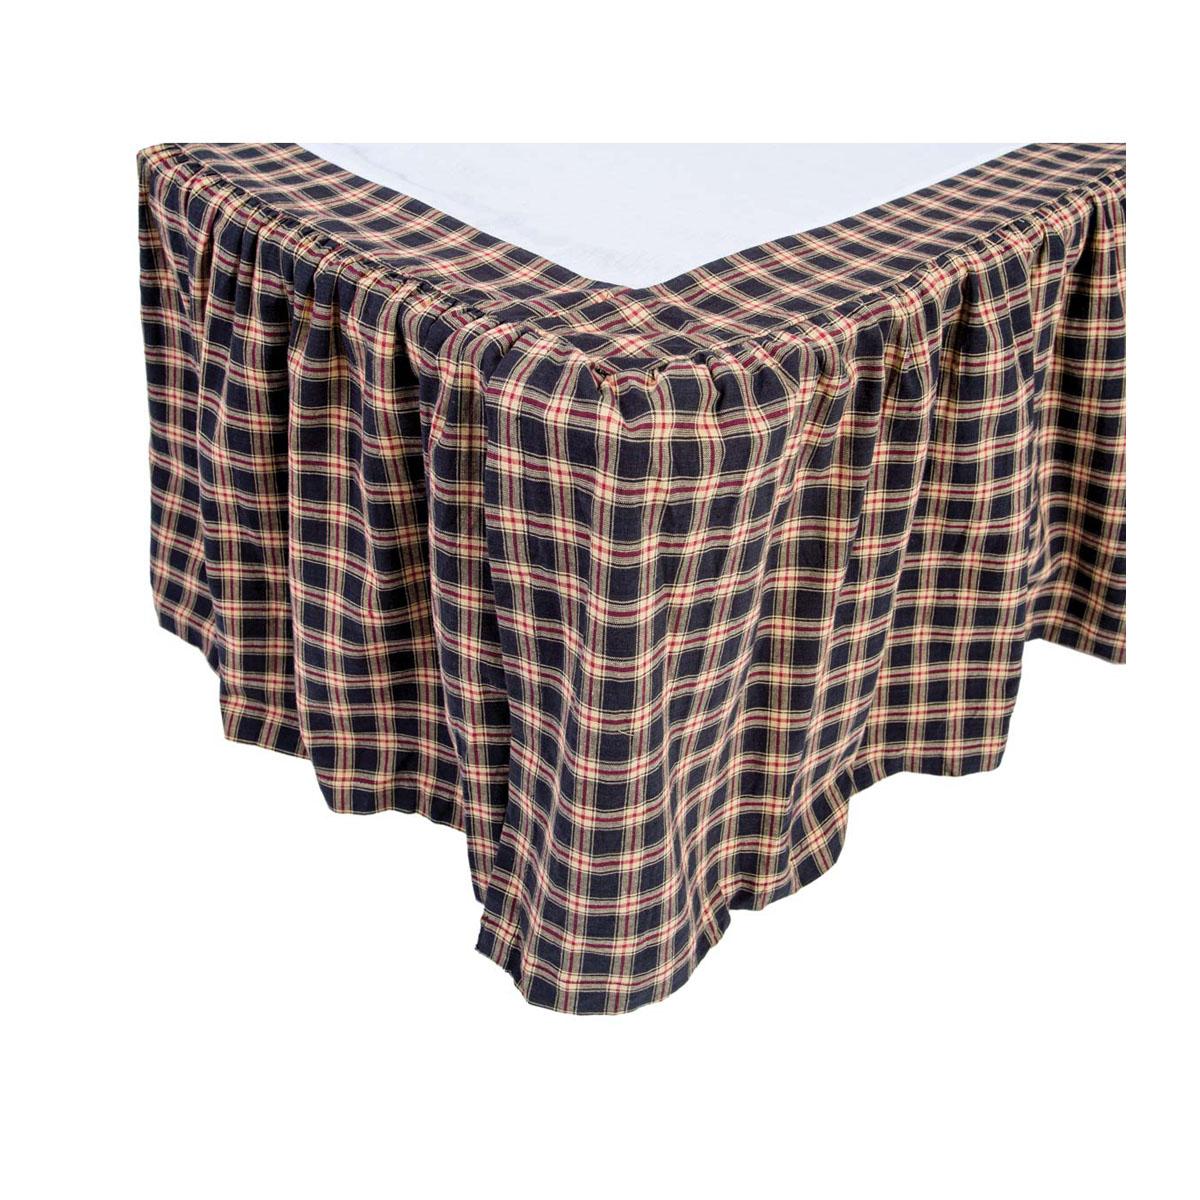 Bingham Star Twin Bed Skirt